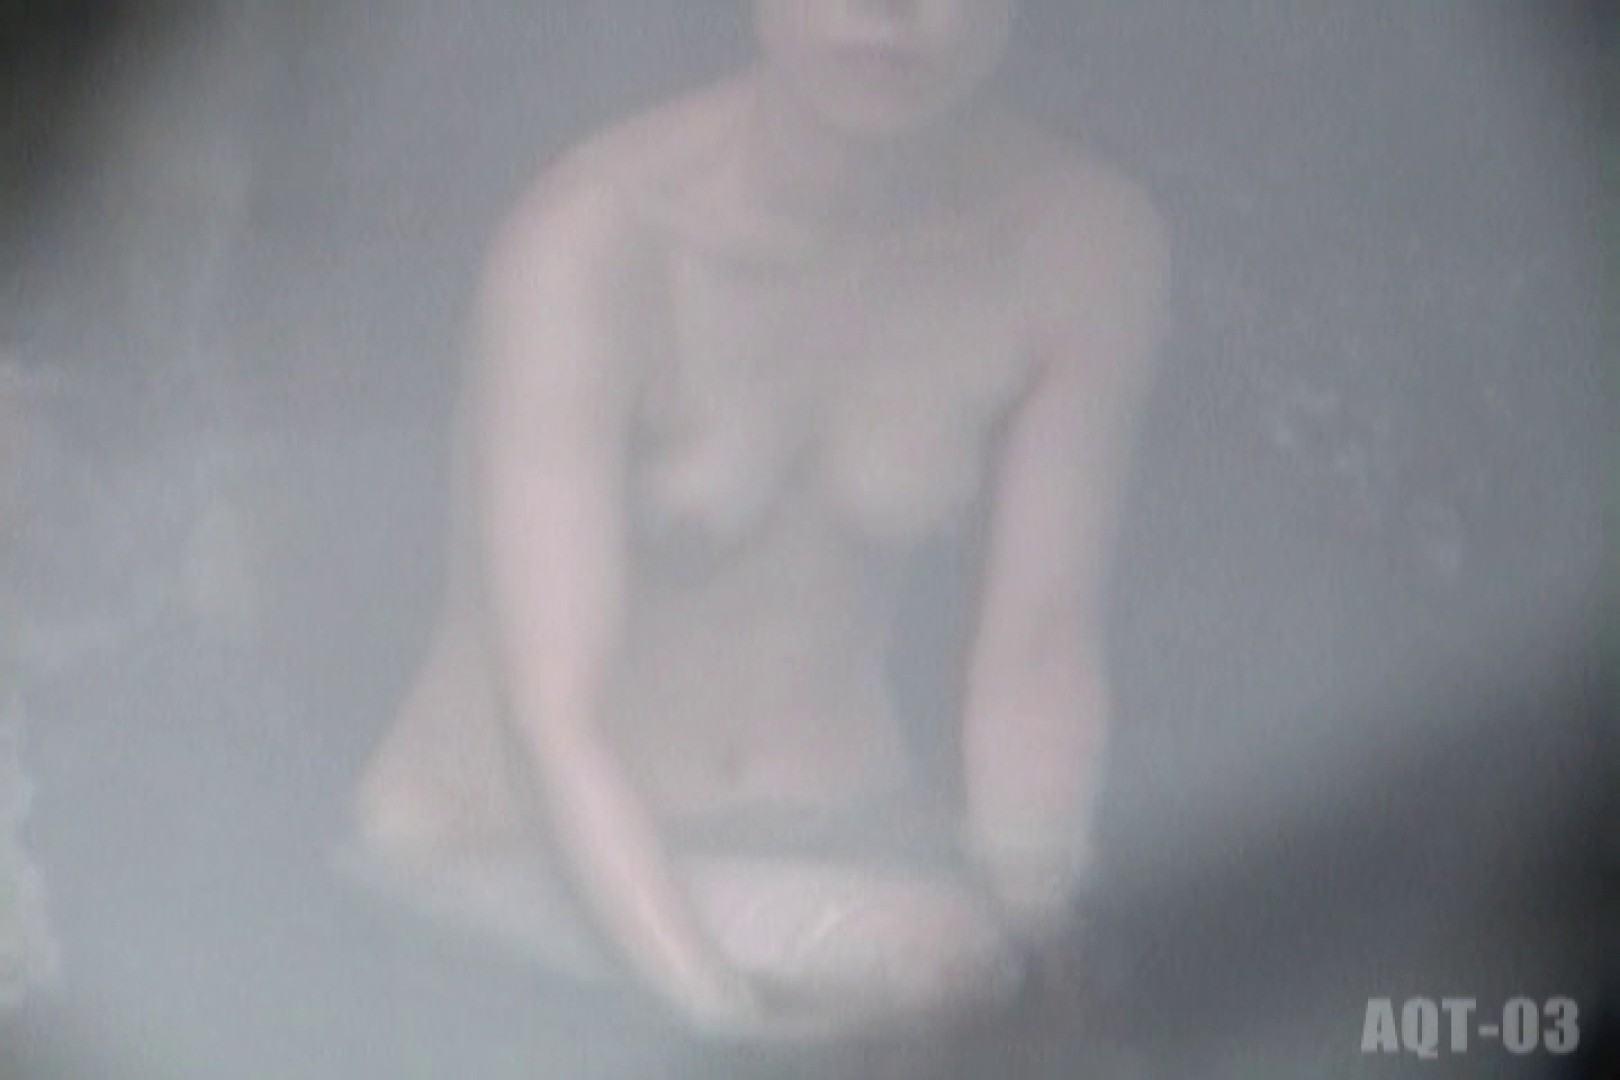 Aquaな露天風呂Vol.734 盗撮 すけべAV動画紹介 68枚 2